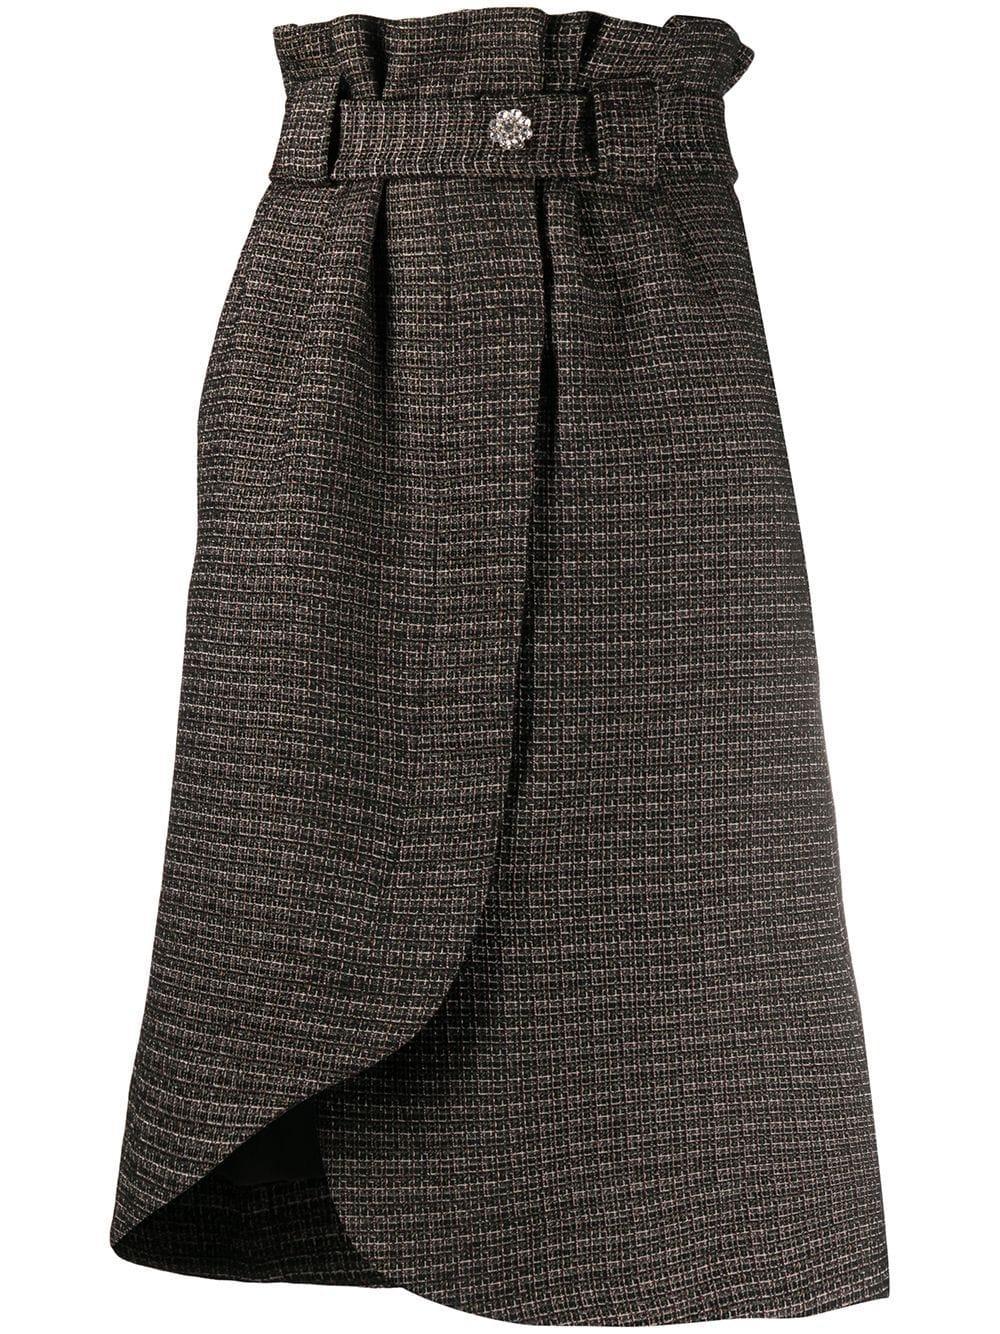 GANNI tweed wrap skirt